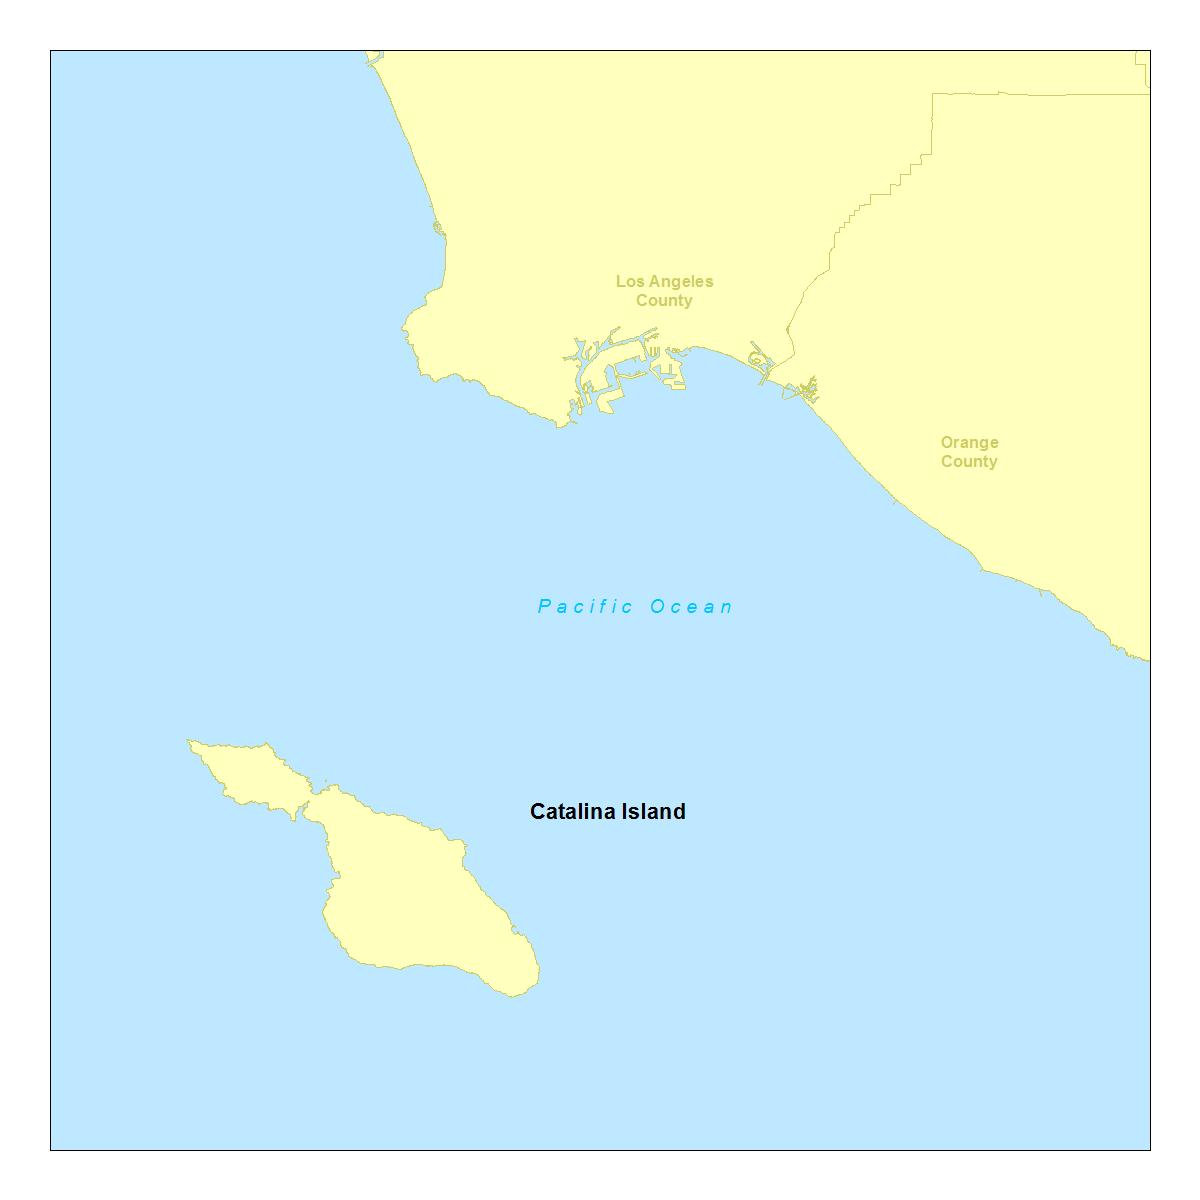 Map of Catalina Island study area